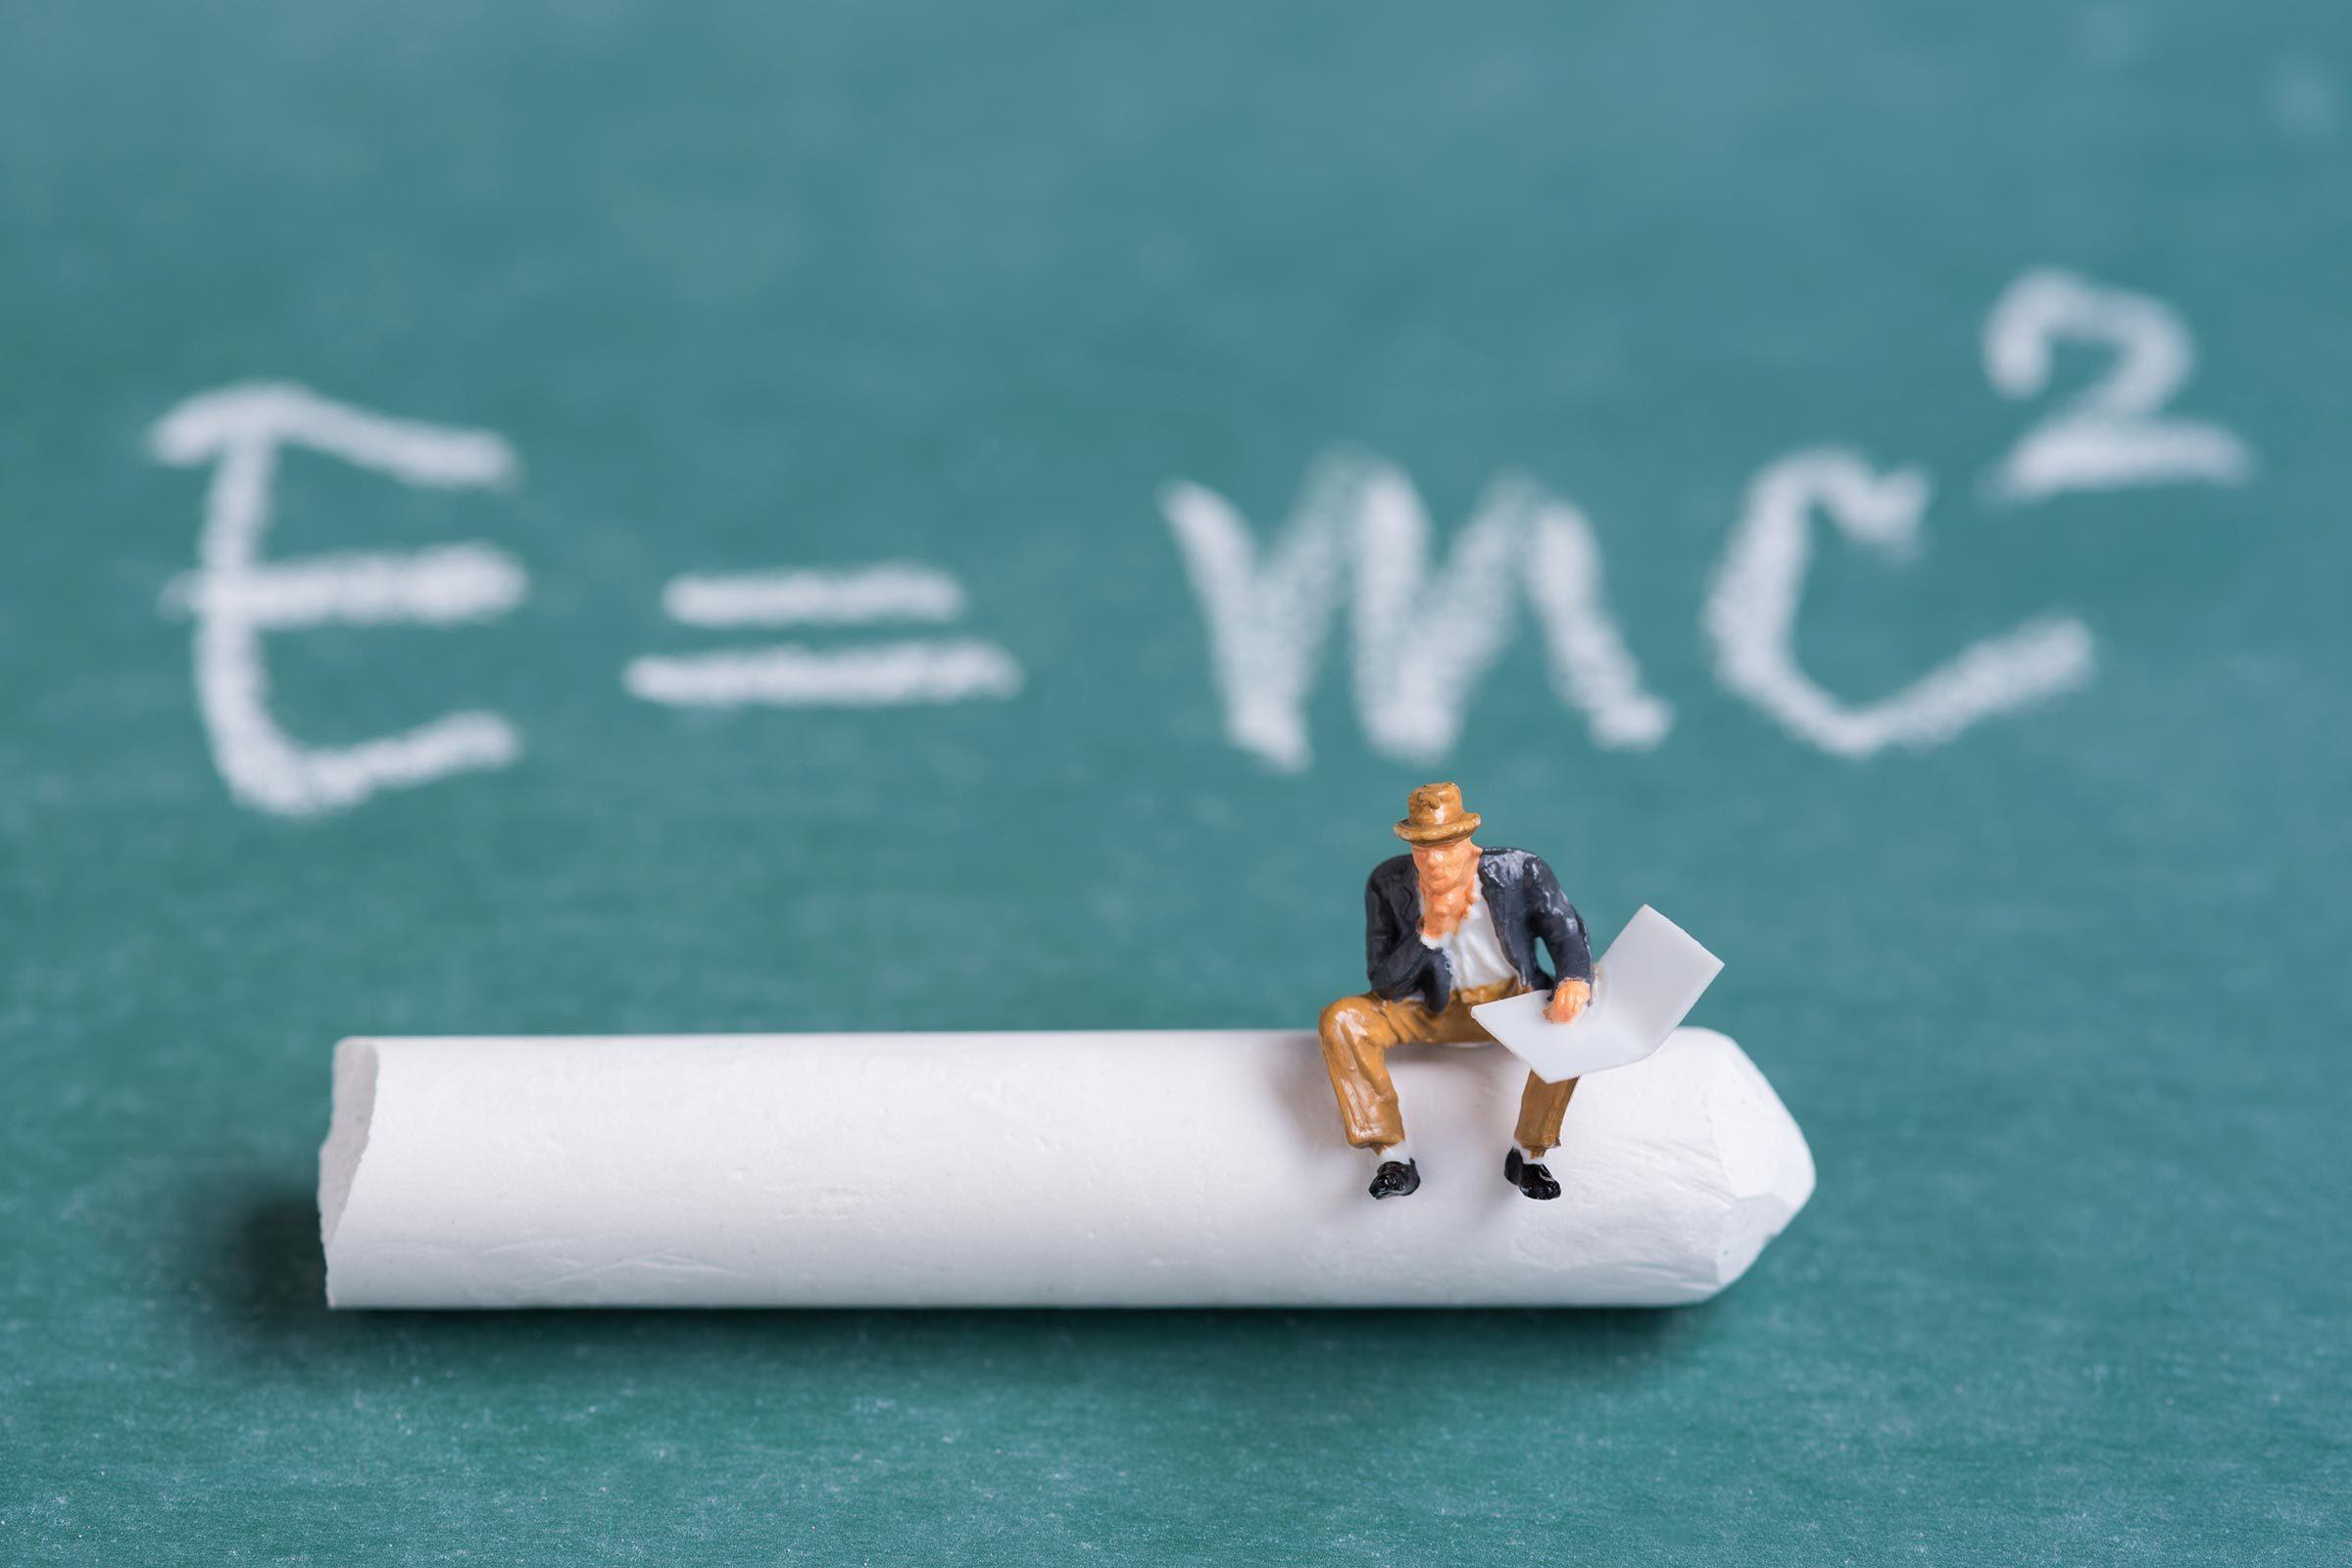 miniature figures school supplies books classroom